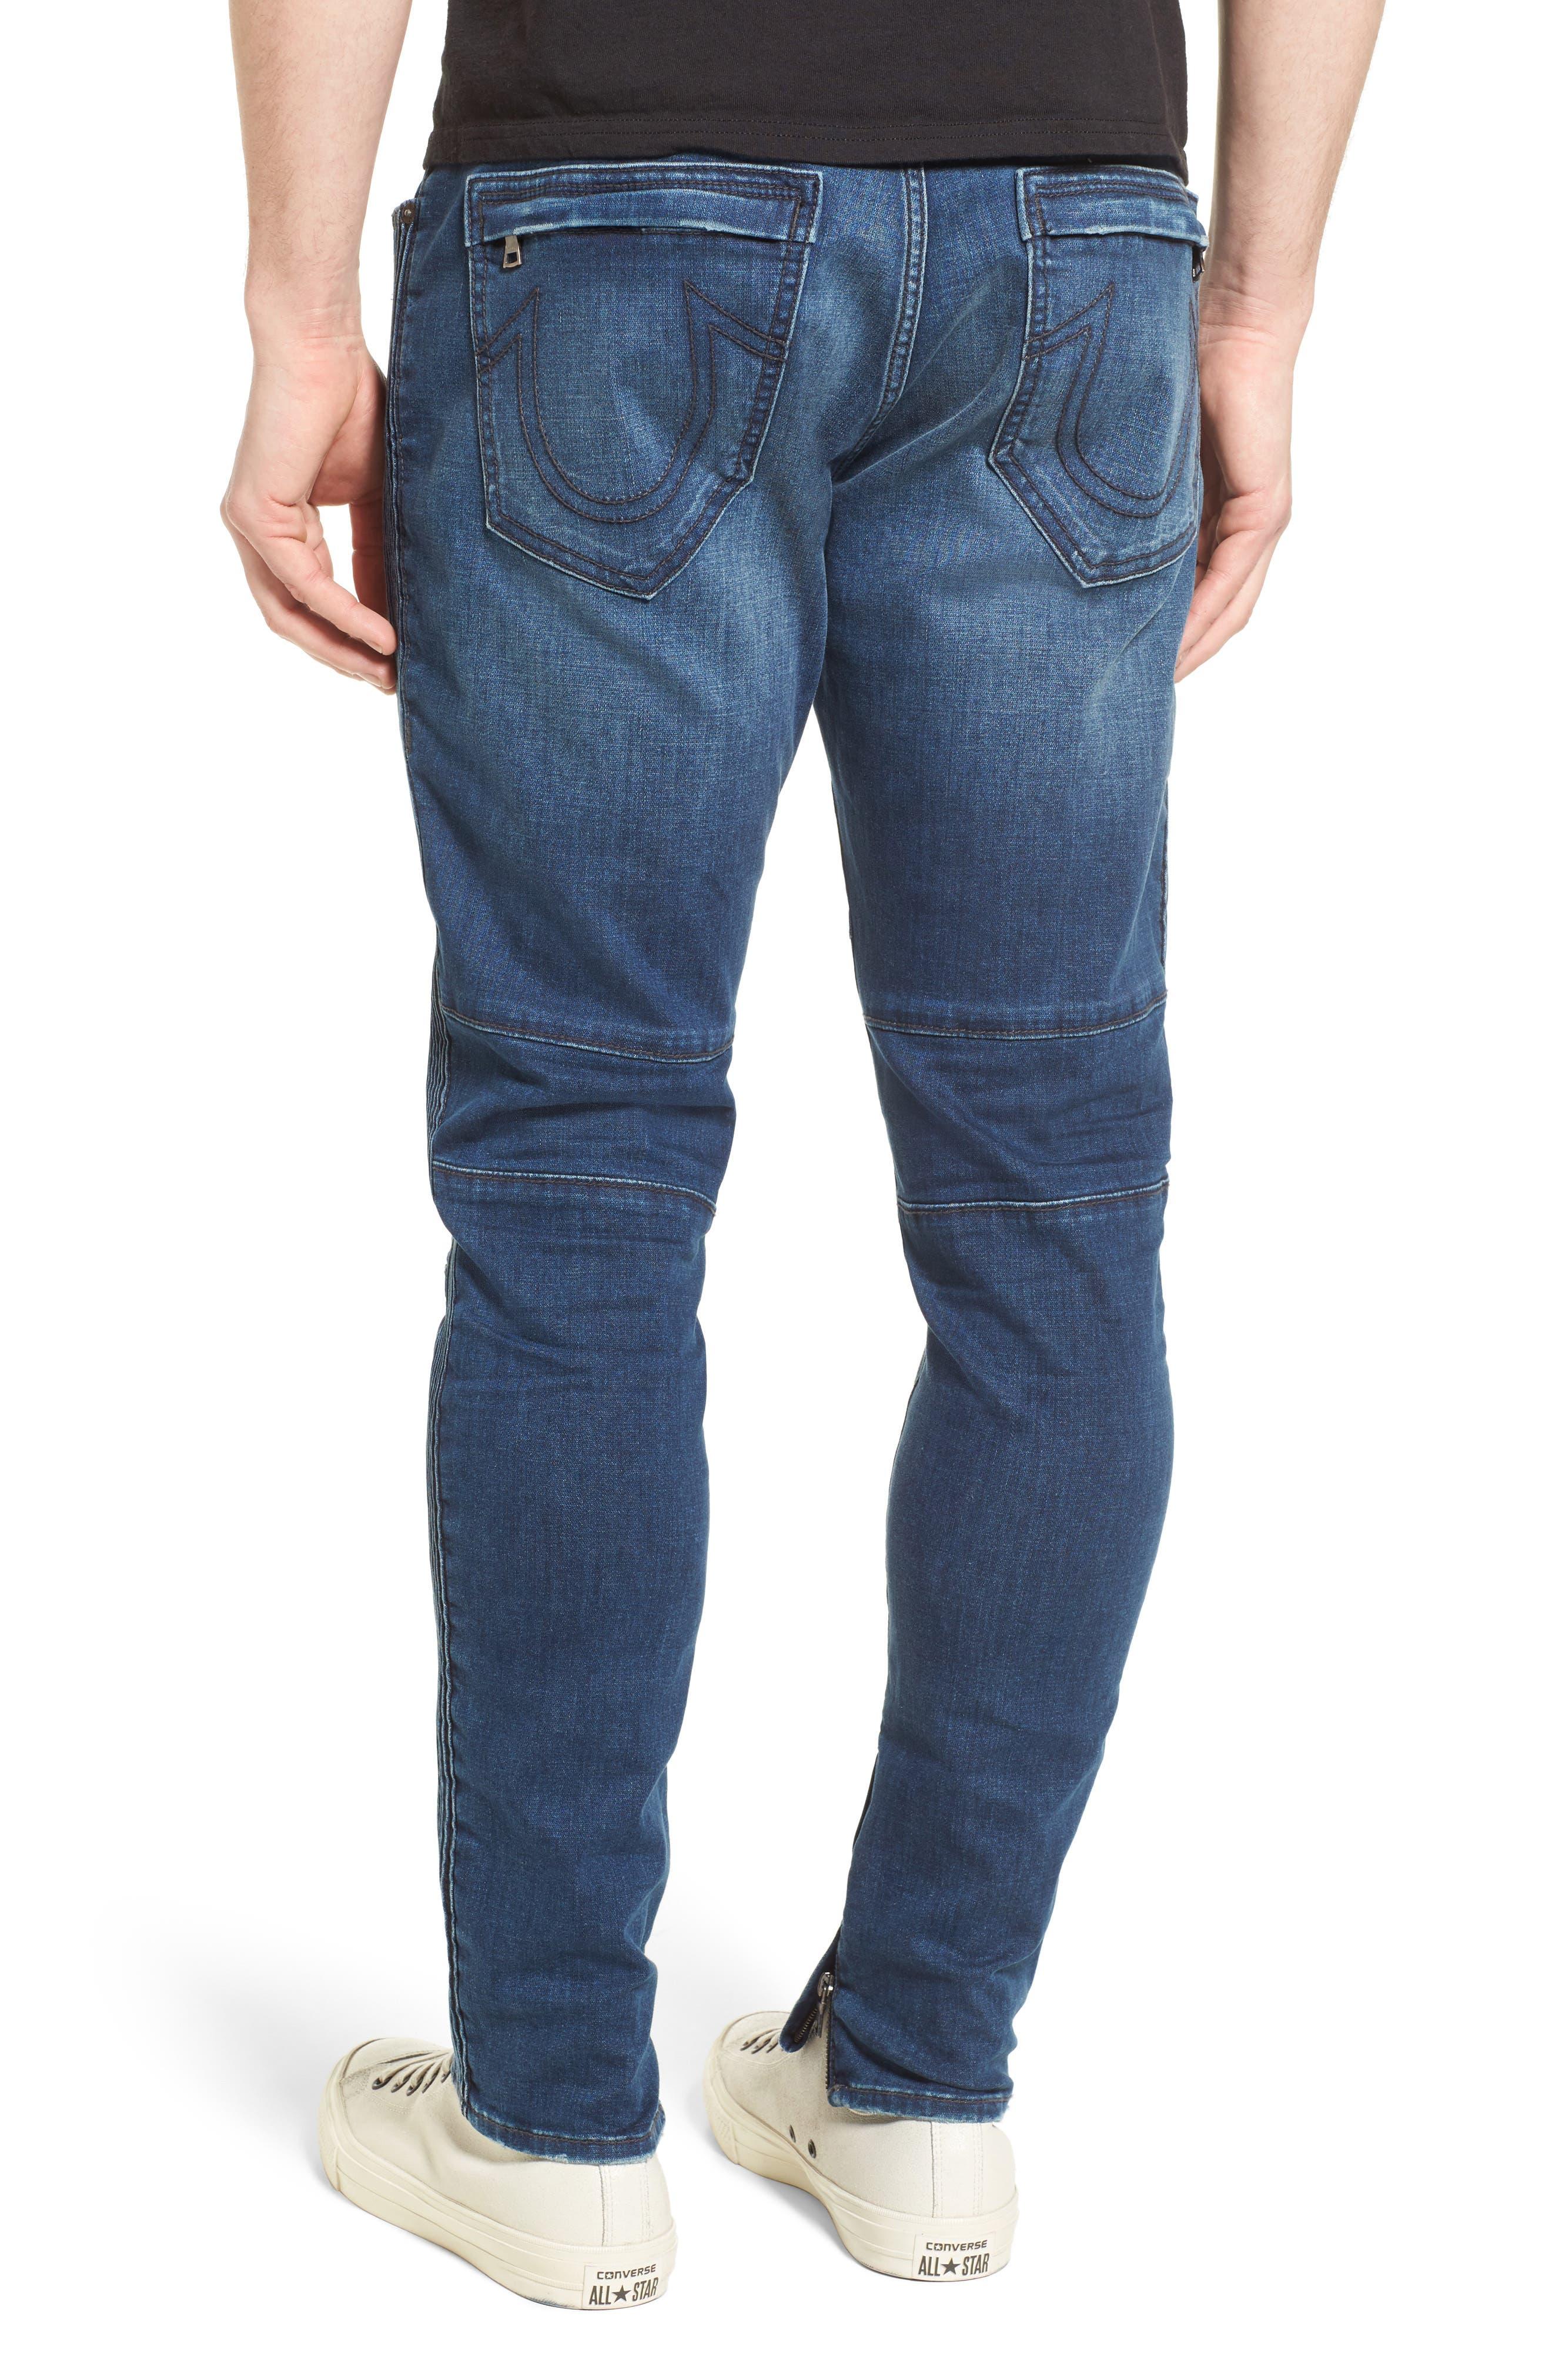 Racer Skinny Fit Jeans,                             Alternate thumbnail 2, color,                             WHISKEY BLUES